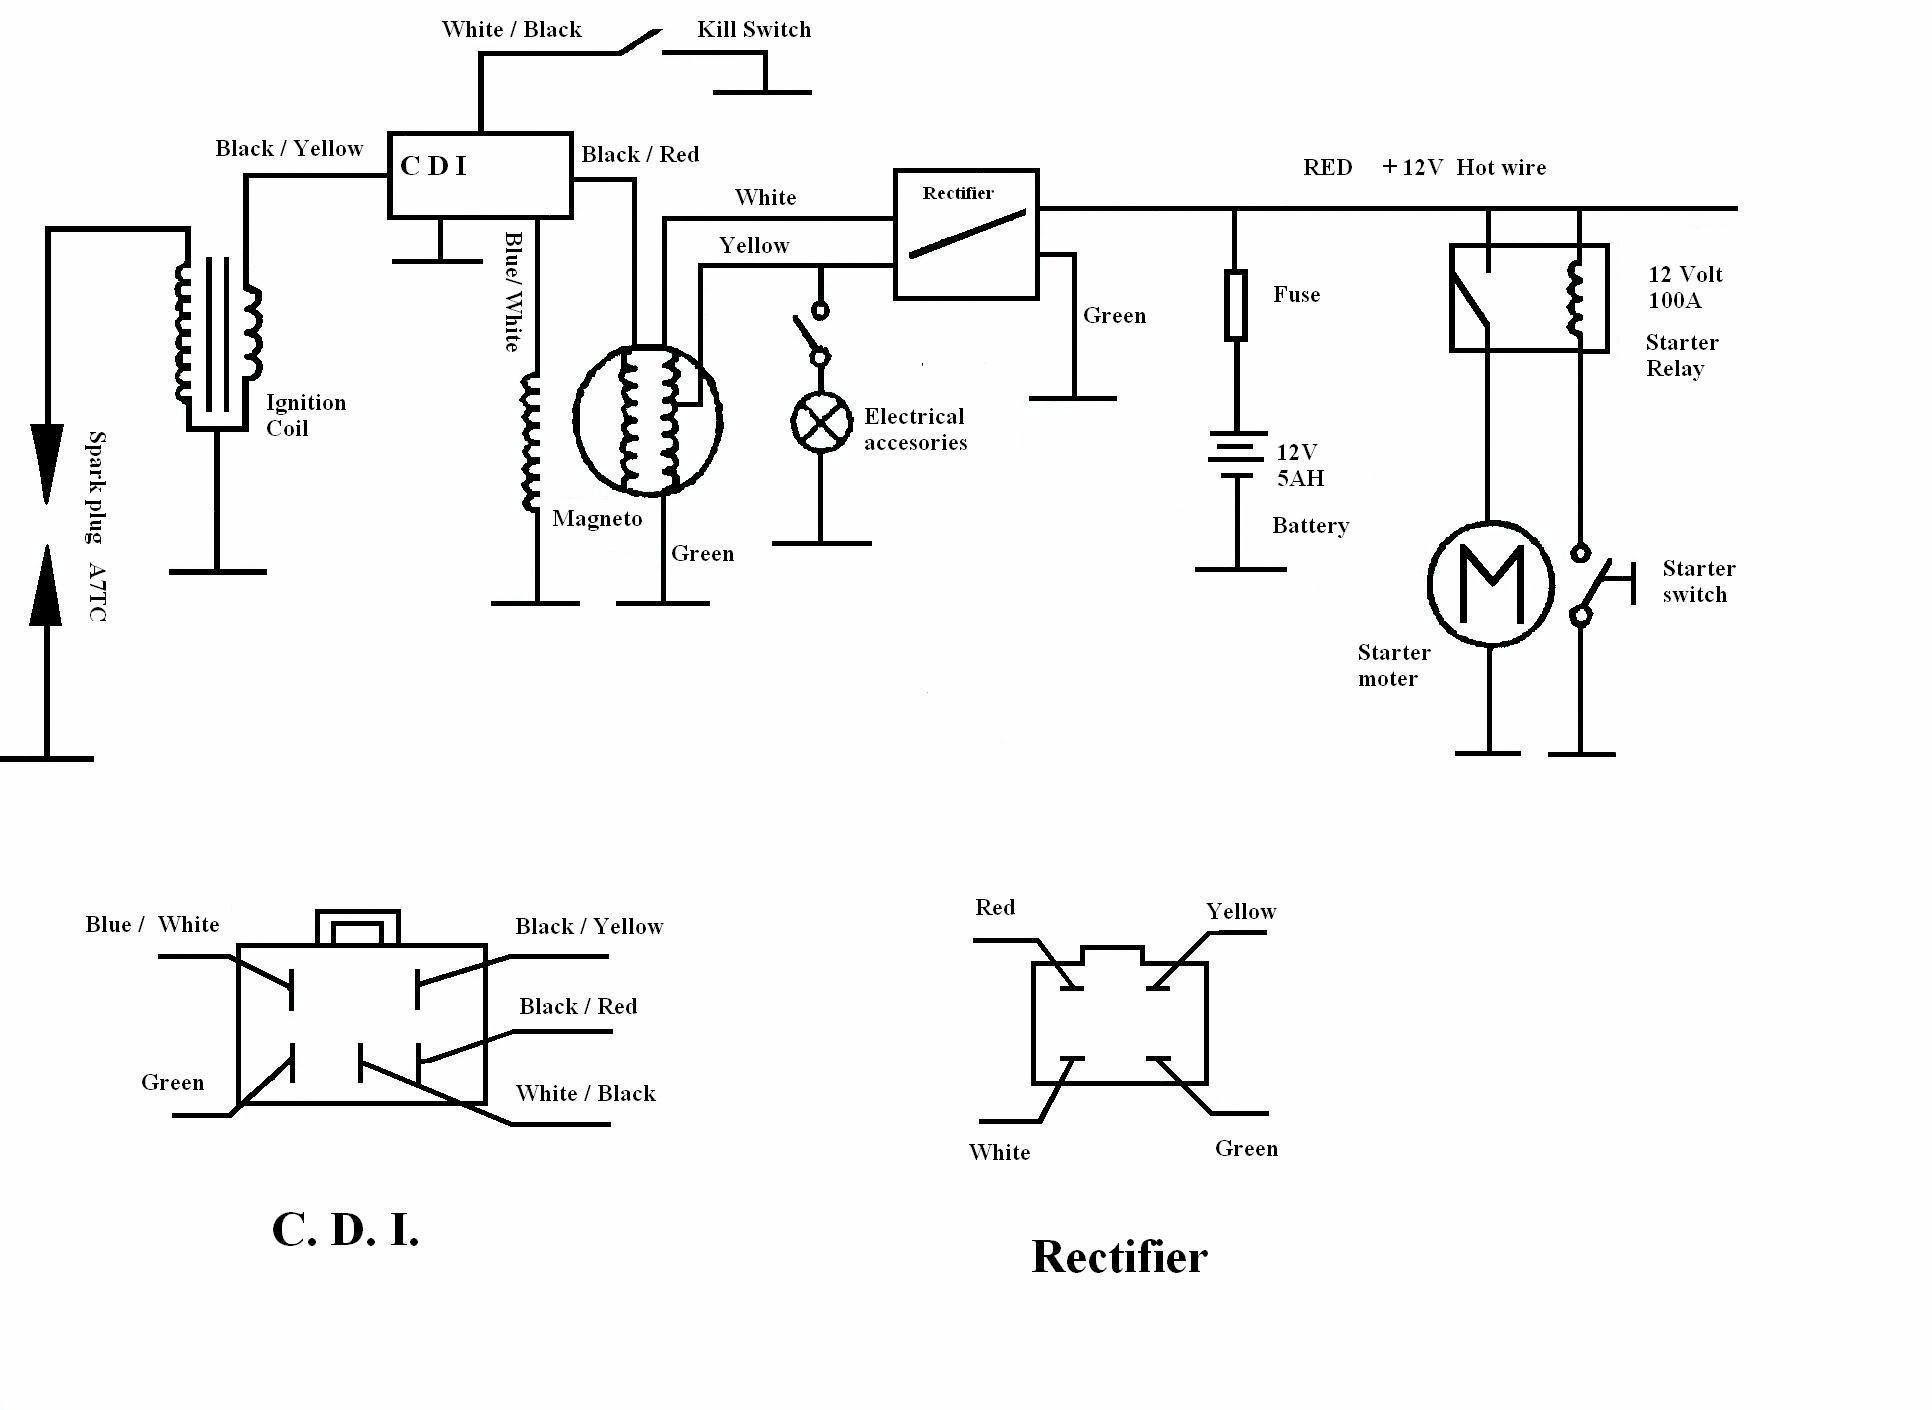 Wiring Diagram Lifan 125